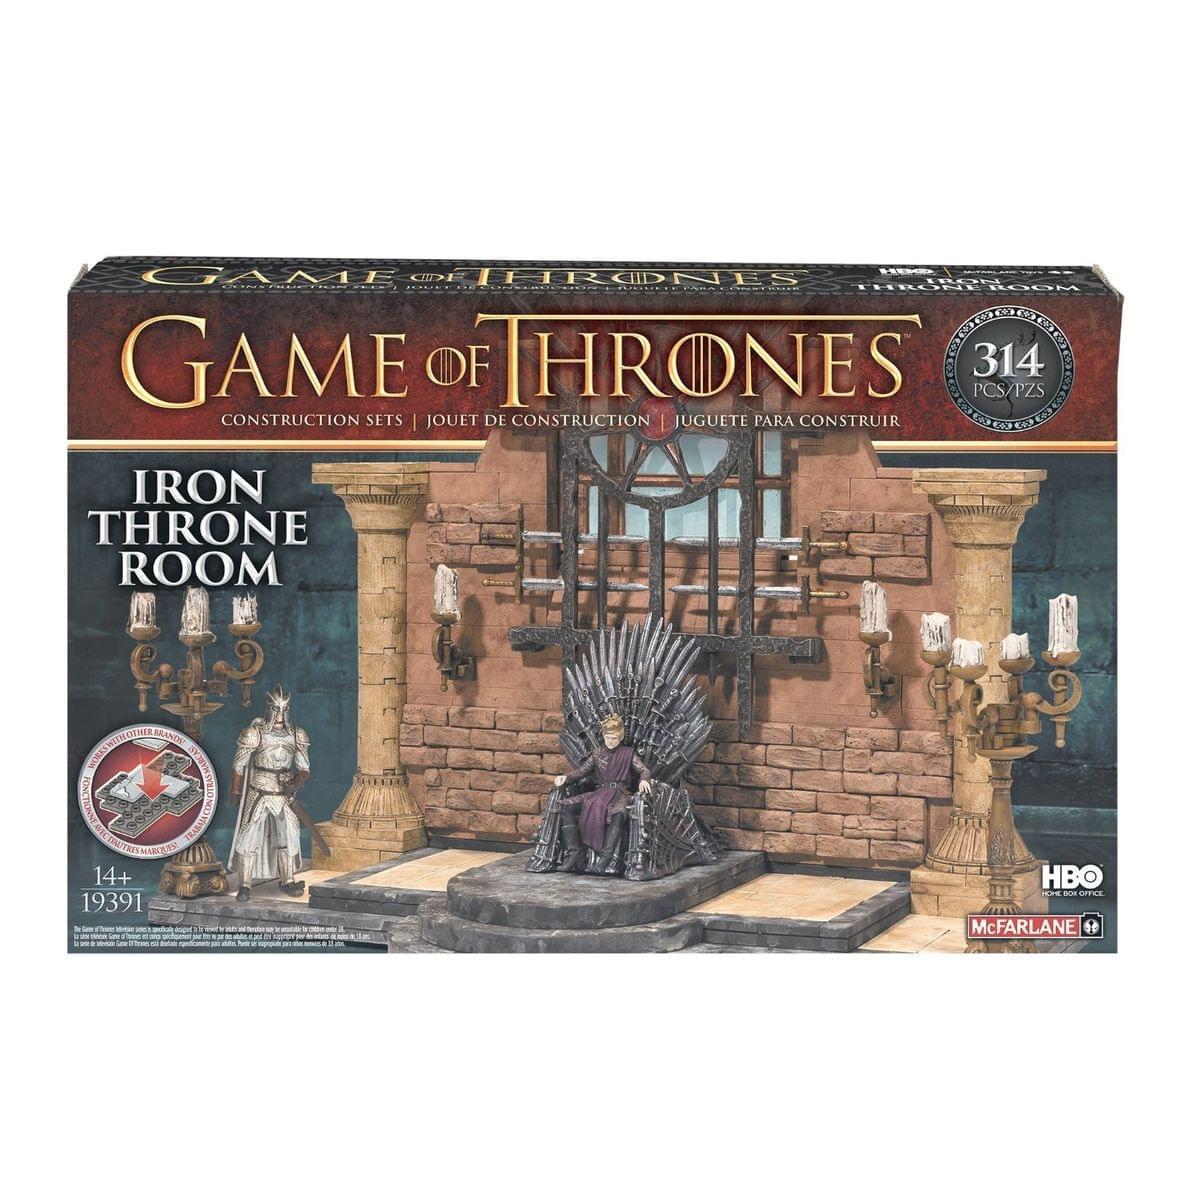 Game of Thrones Consturction Set Iron Throne Room